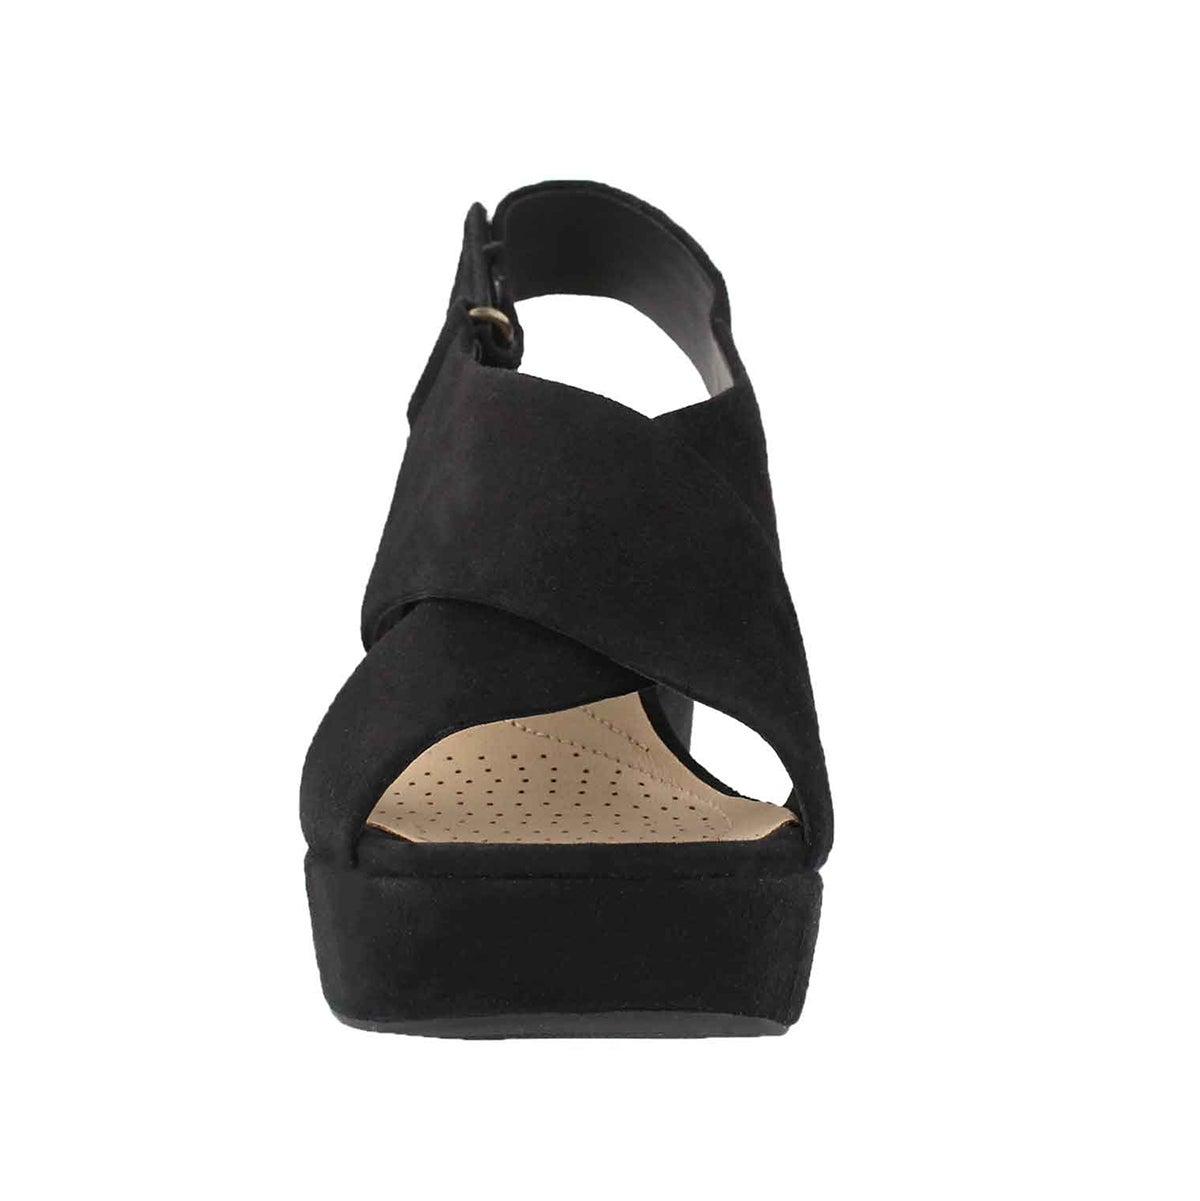 Lds Maritsa Lara black dress sandal